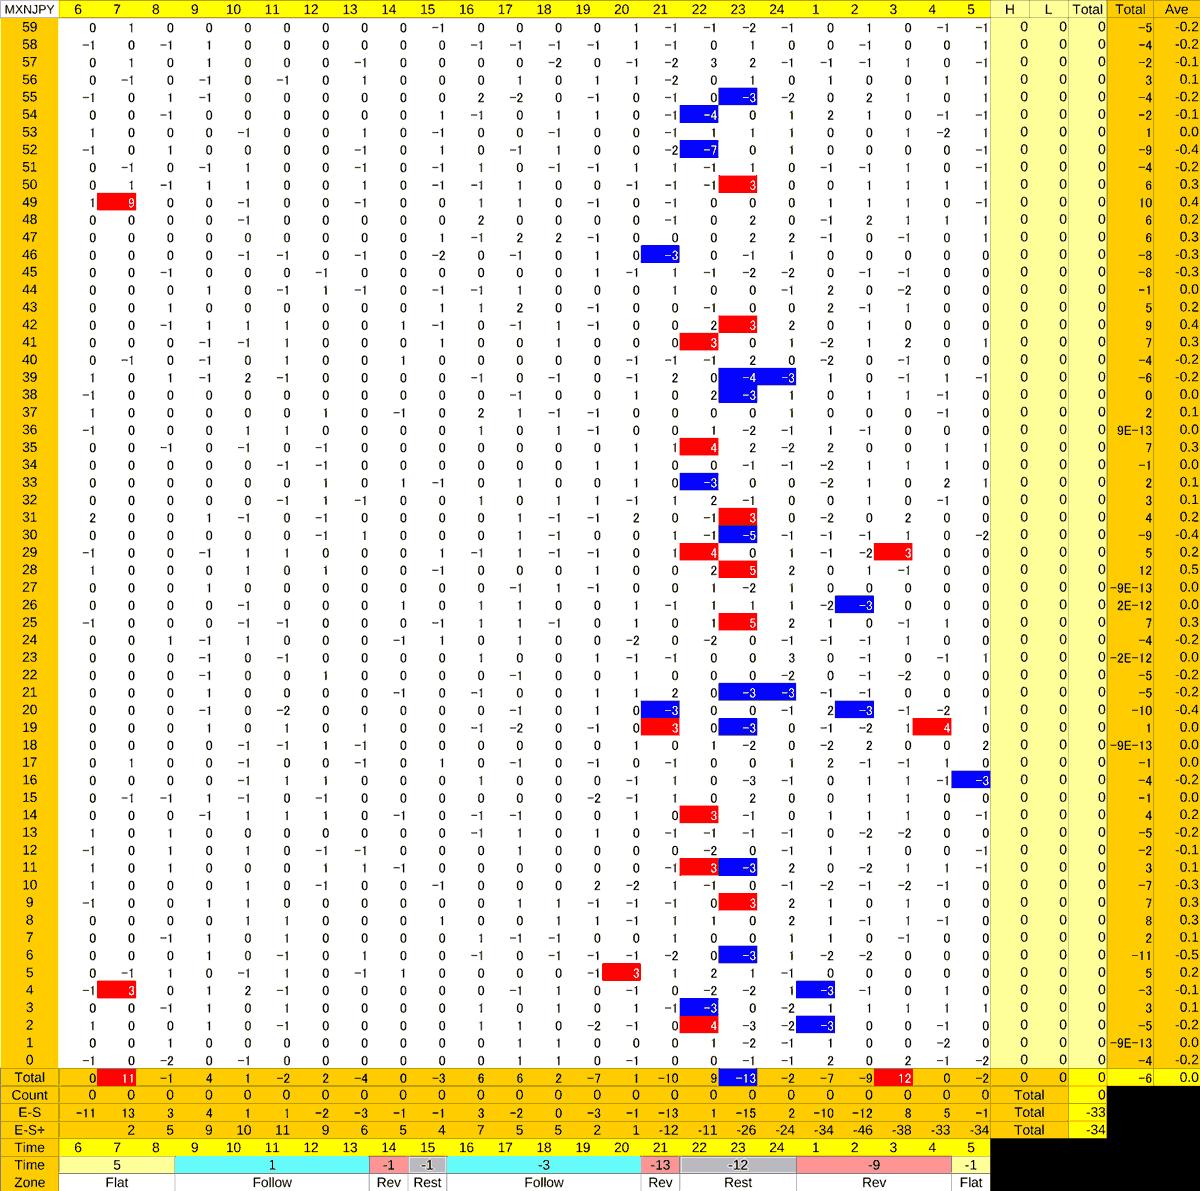 20210121_HS(3)MXNJPY